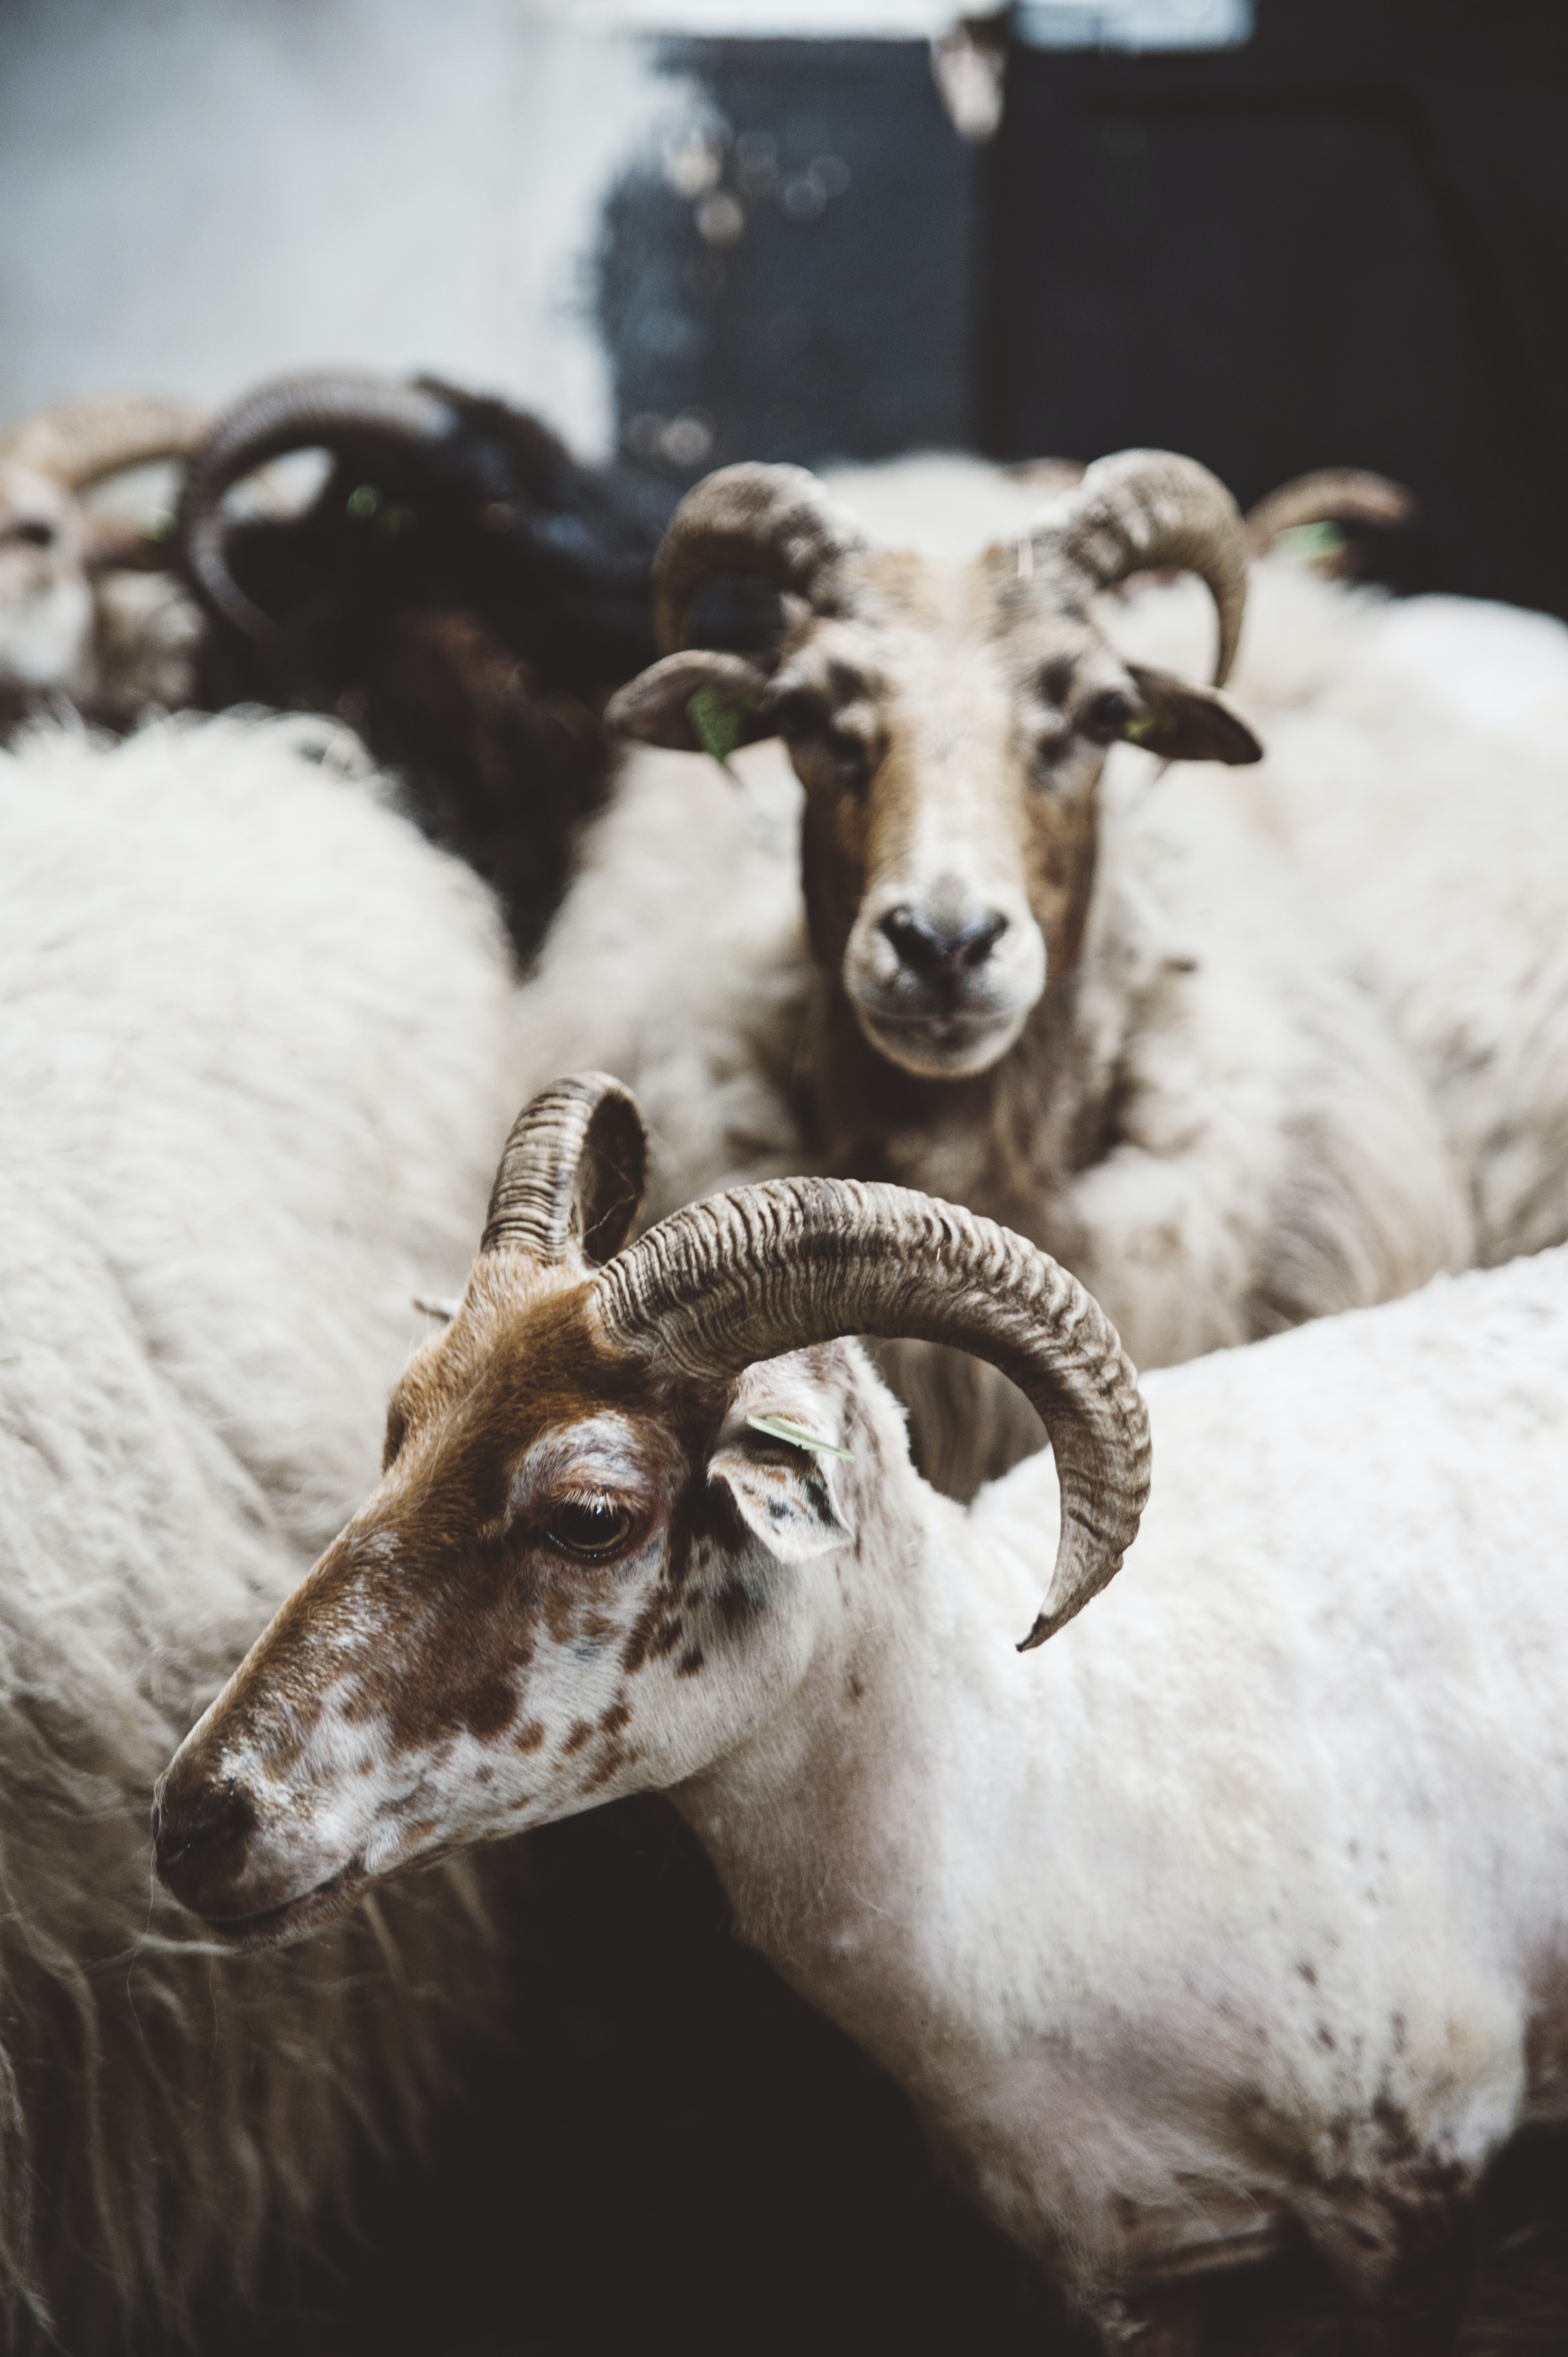 The Ram (Aries Season) stories